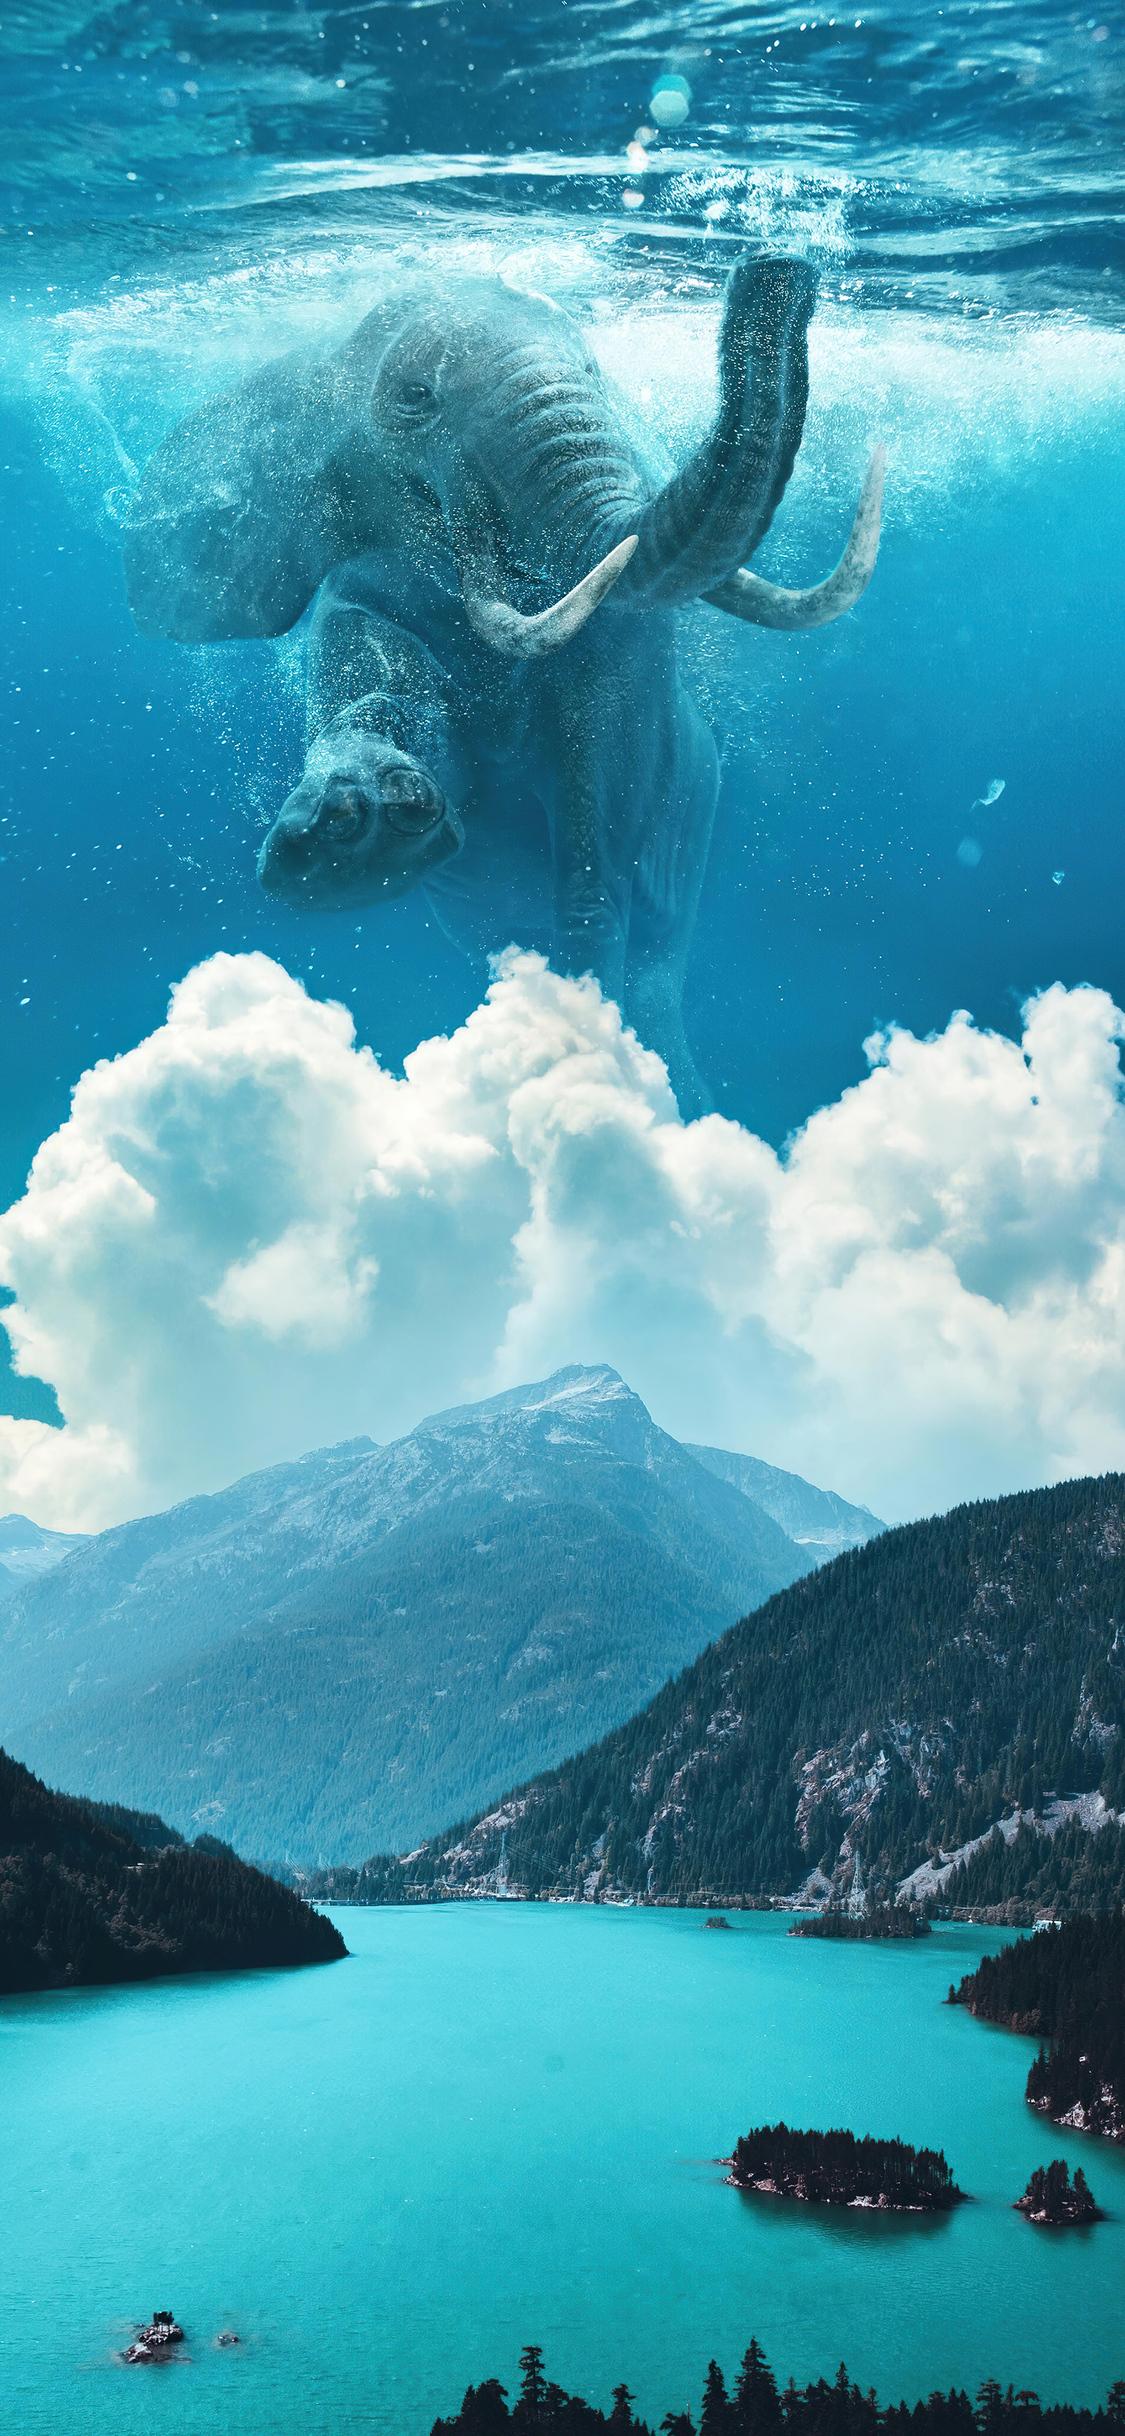 elephant-under-water-manipulation-4k-qm.jpg